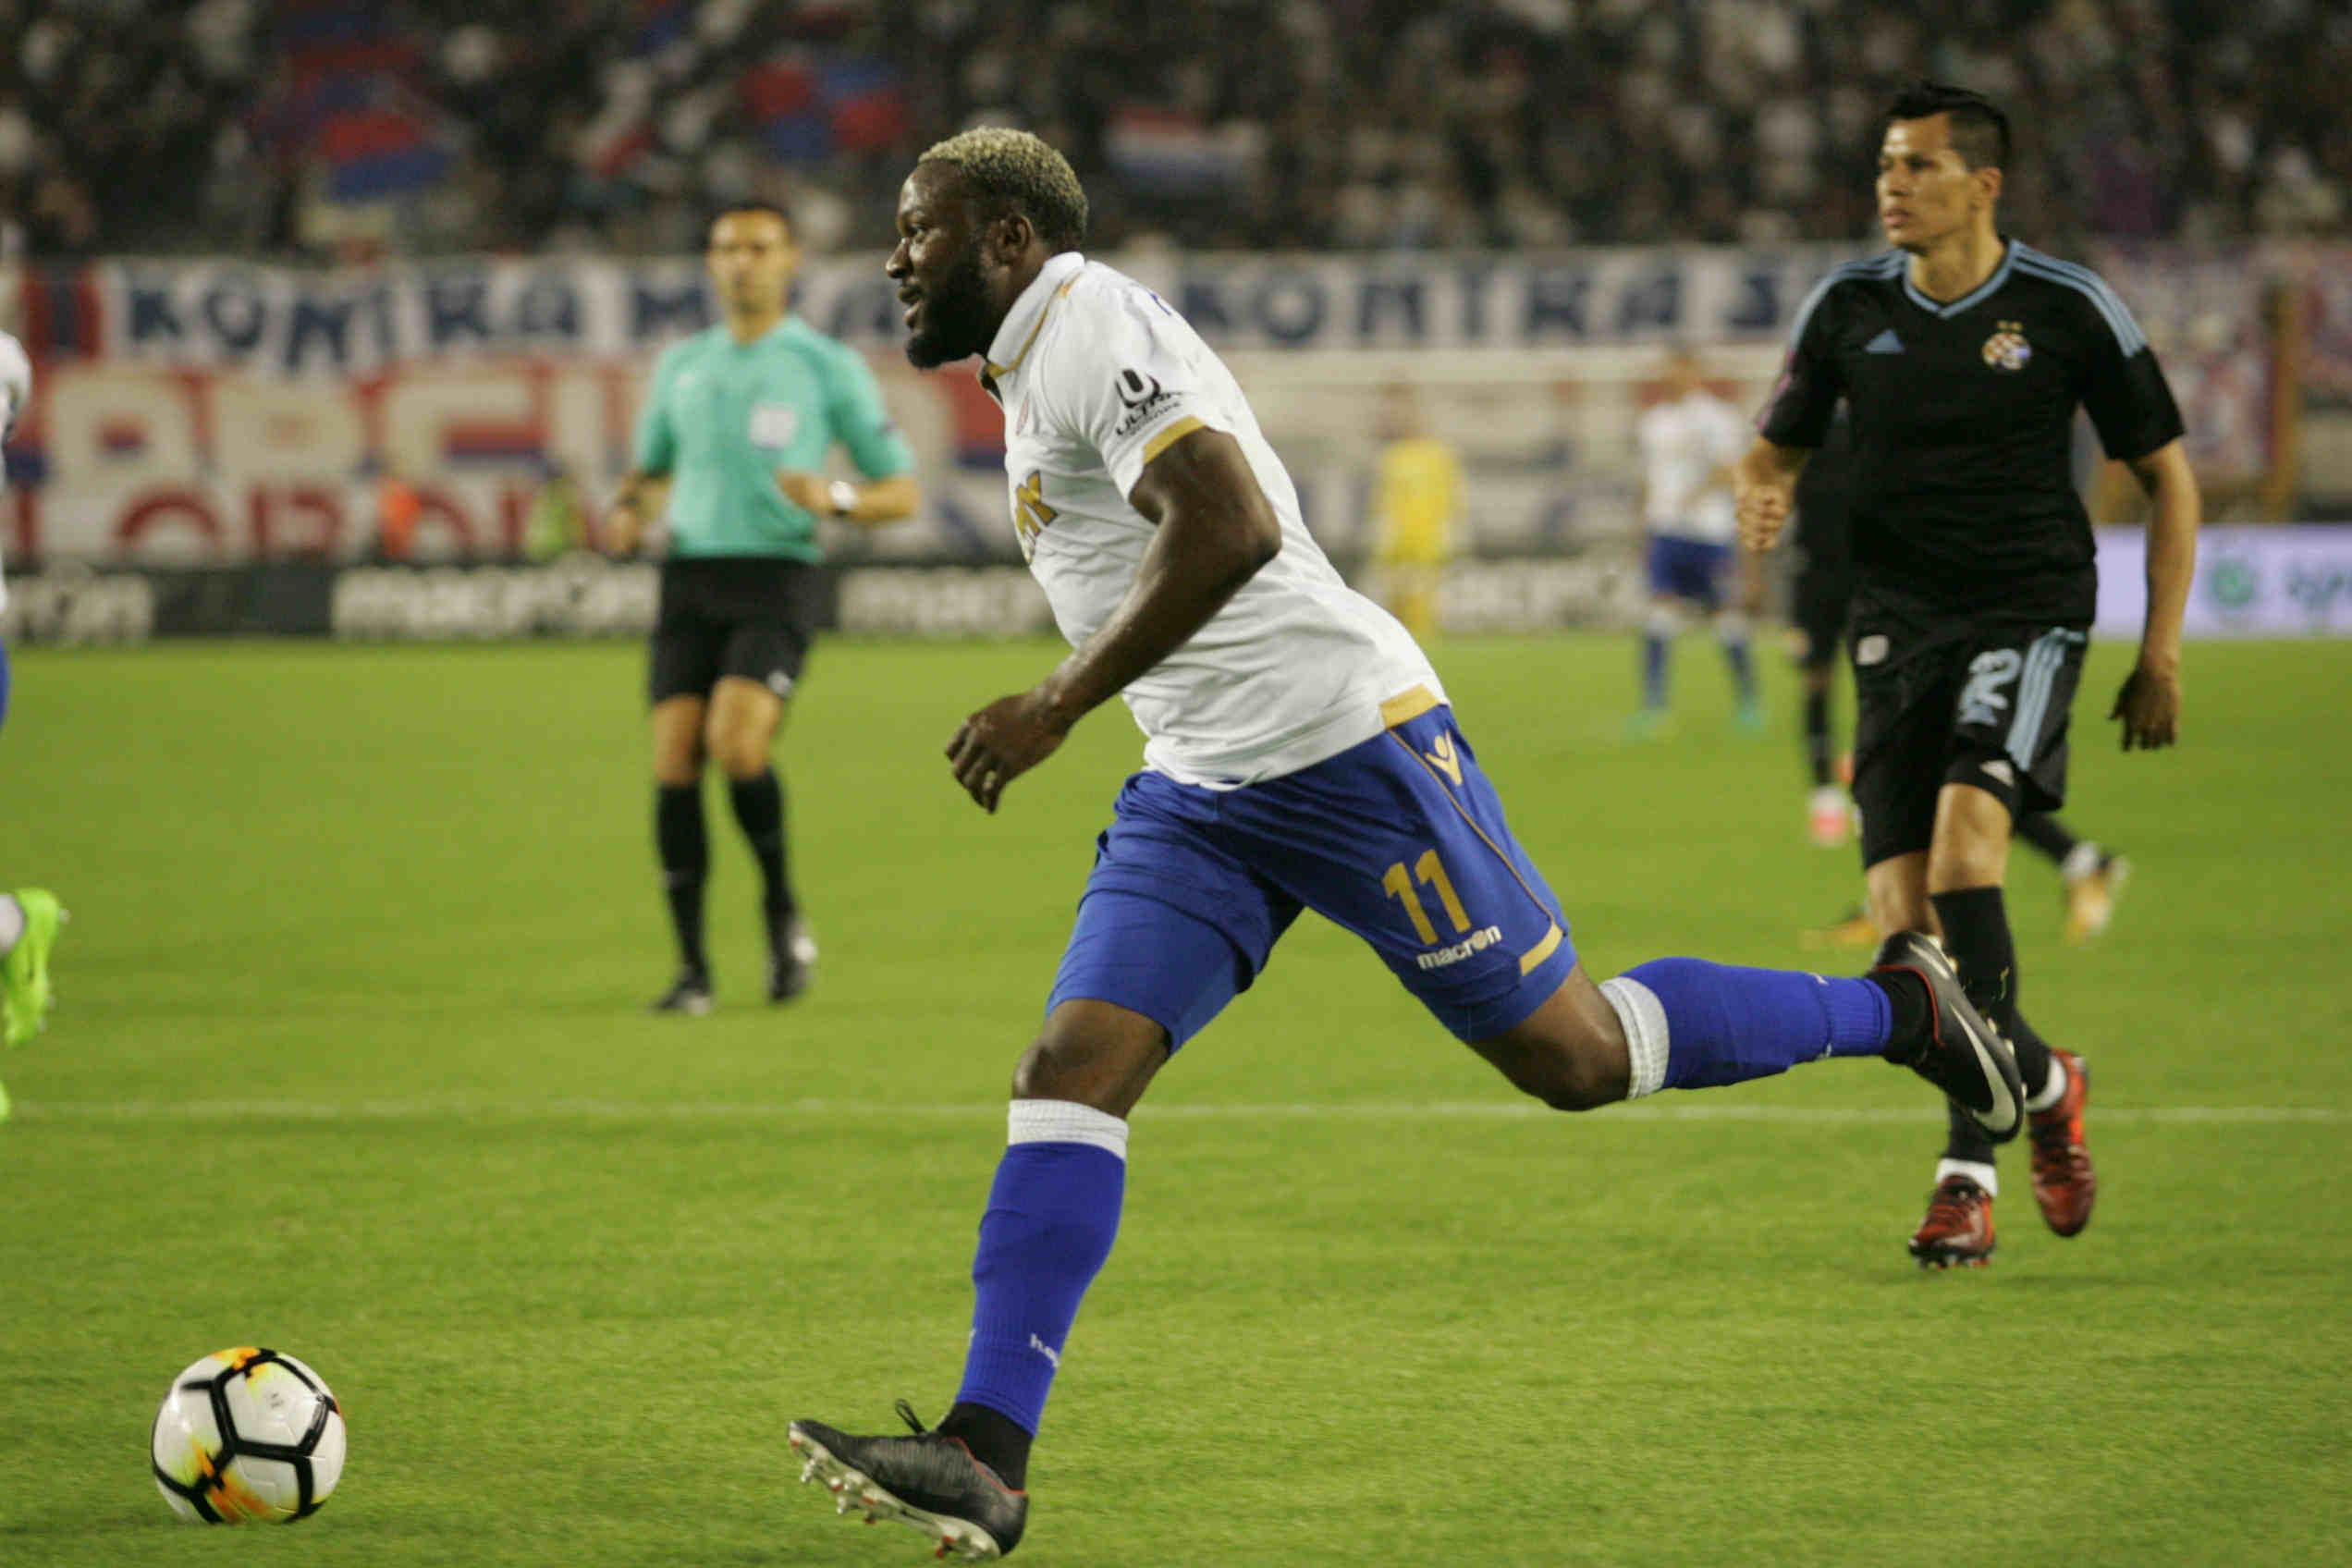 Hajduk - Dinamo / foto: Dražen Biljak